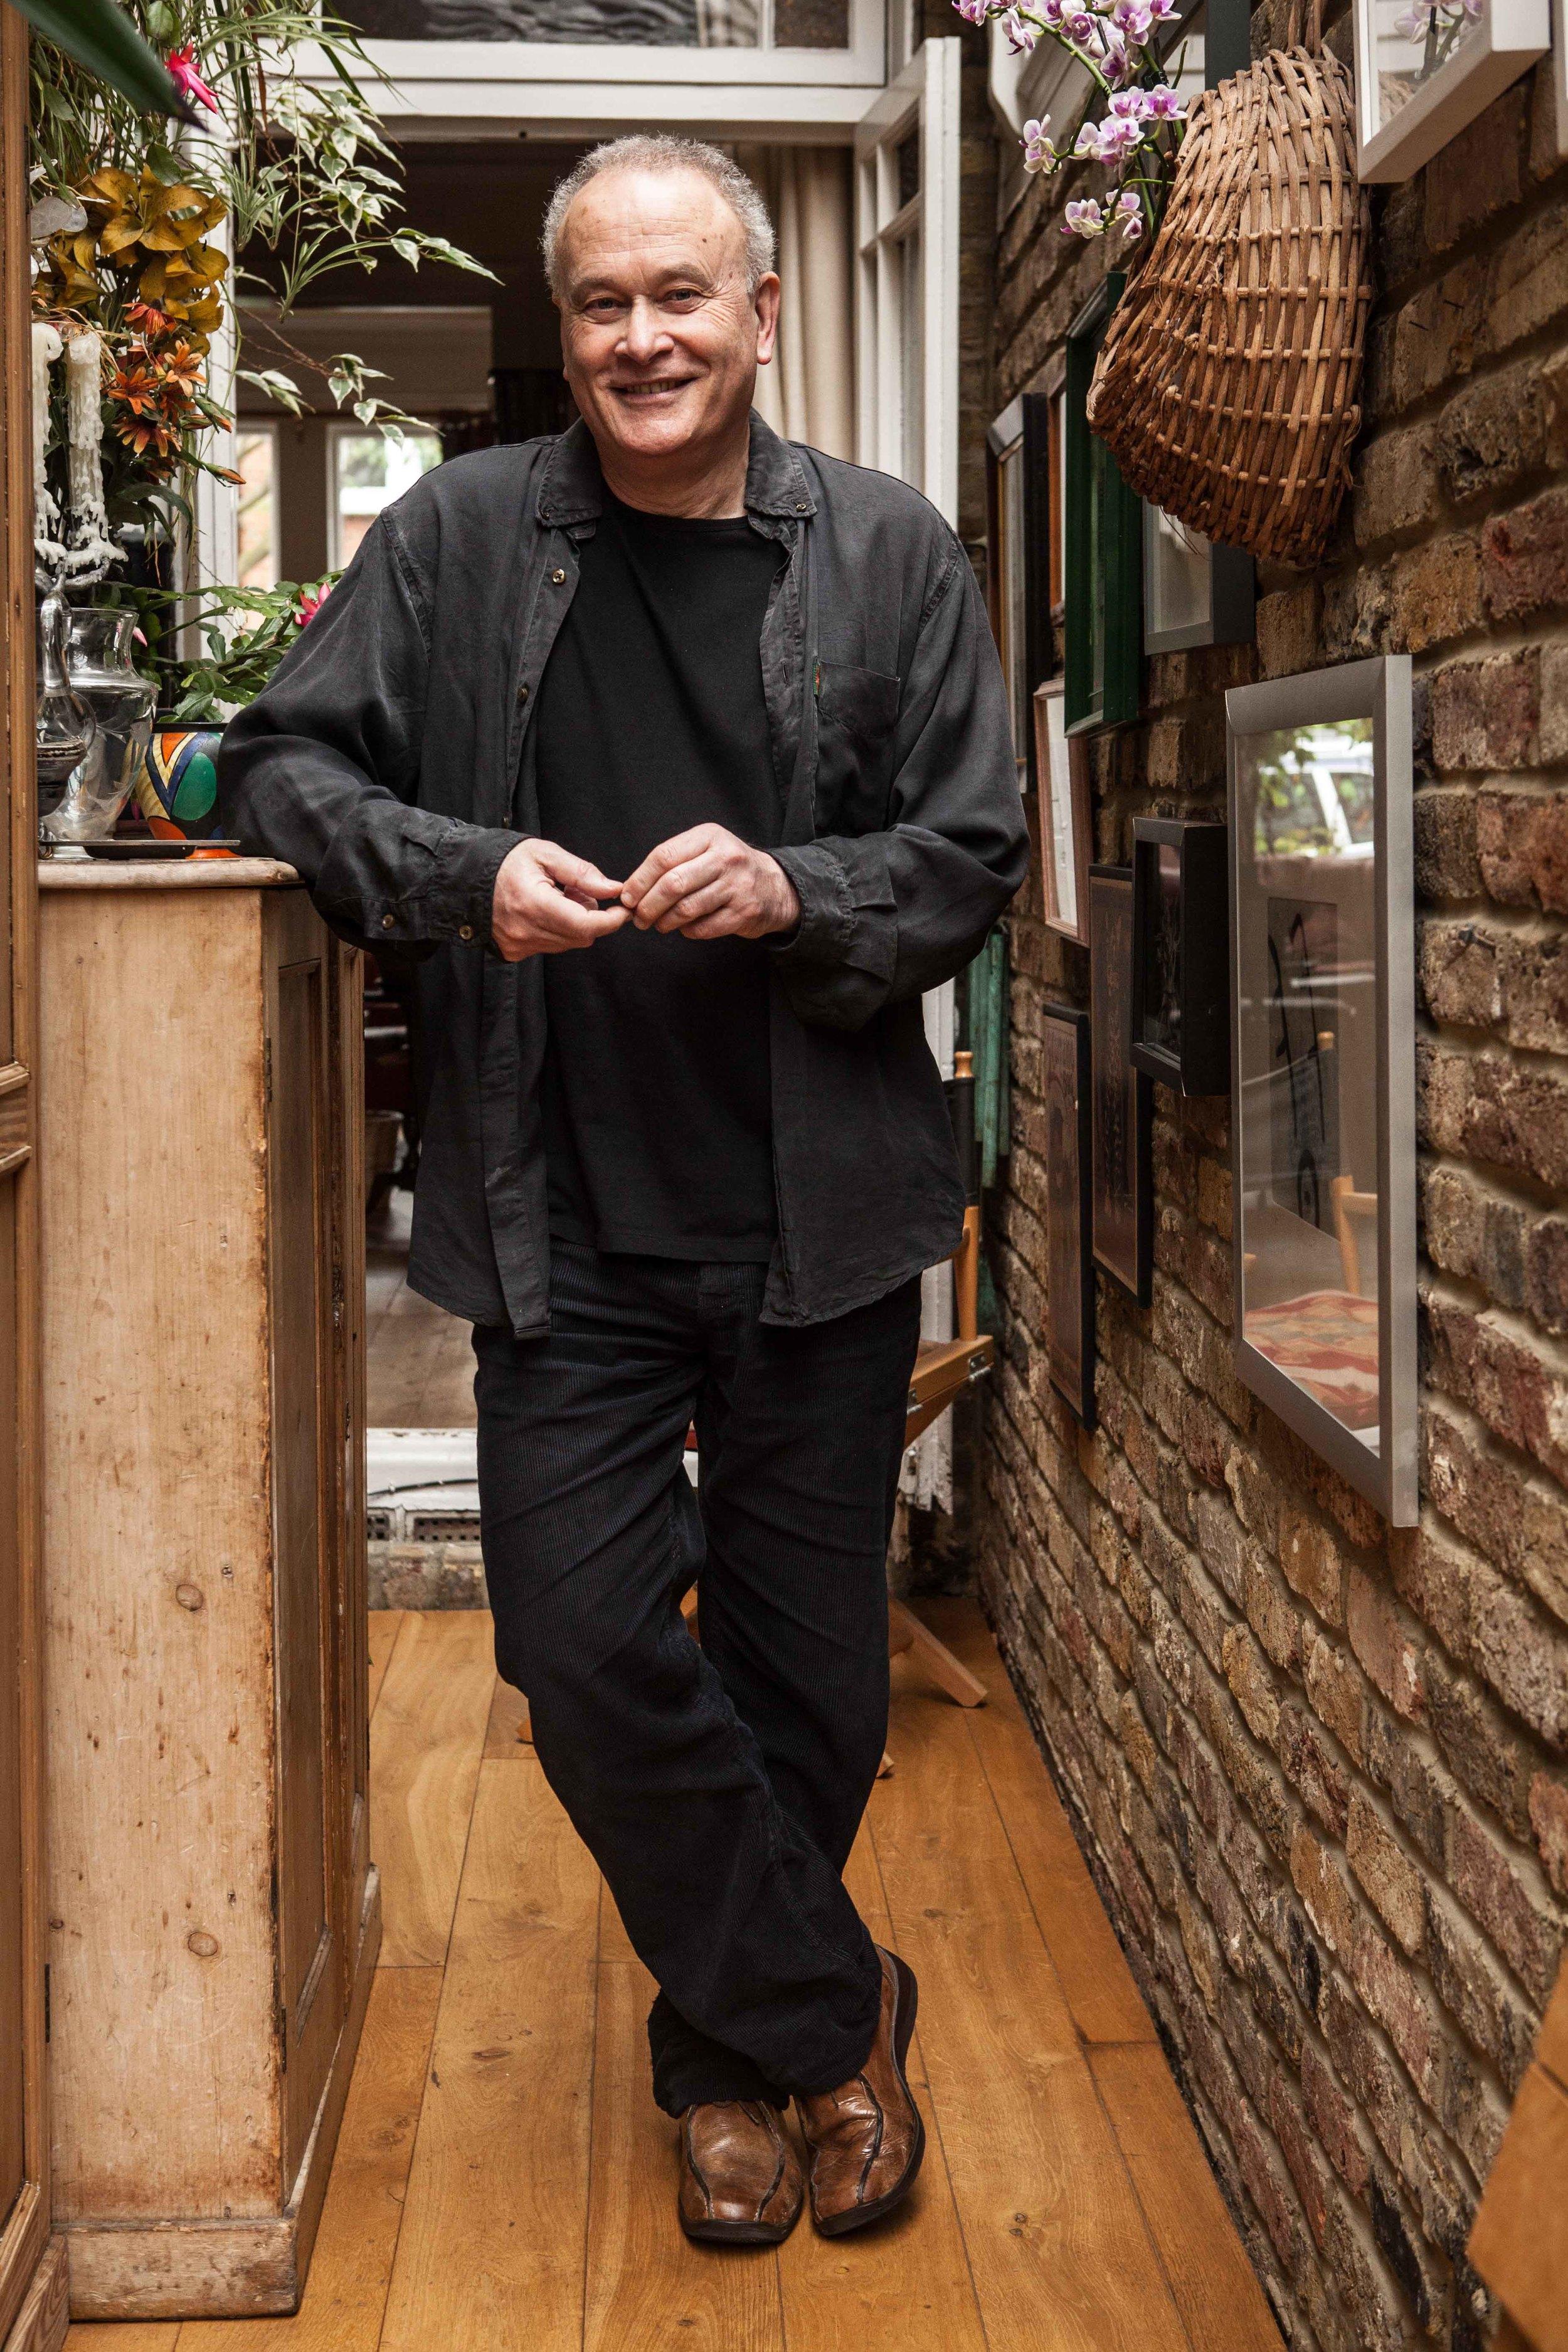 Colin Matthews at home by Fiona Garden 2014